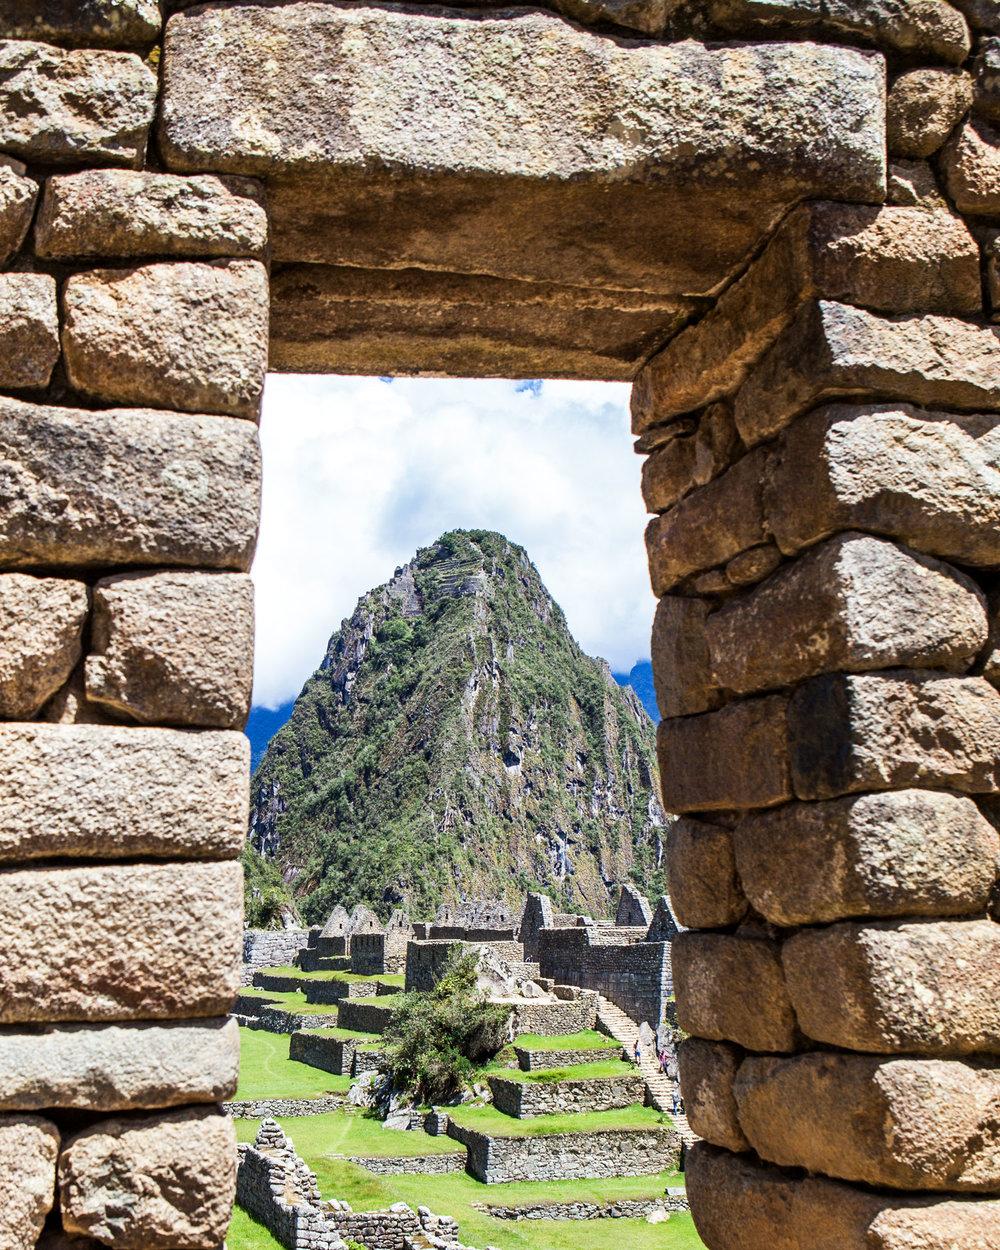 Machu-Picchu-Peru-wander-south-huaynapicchu-7.jpg